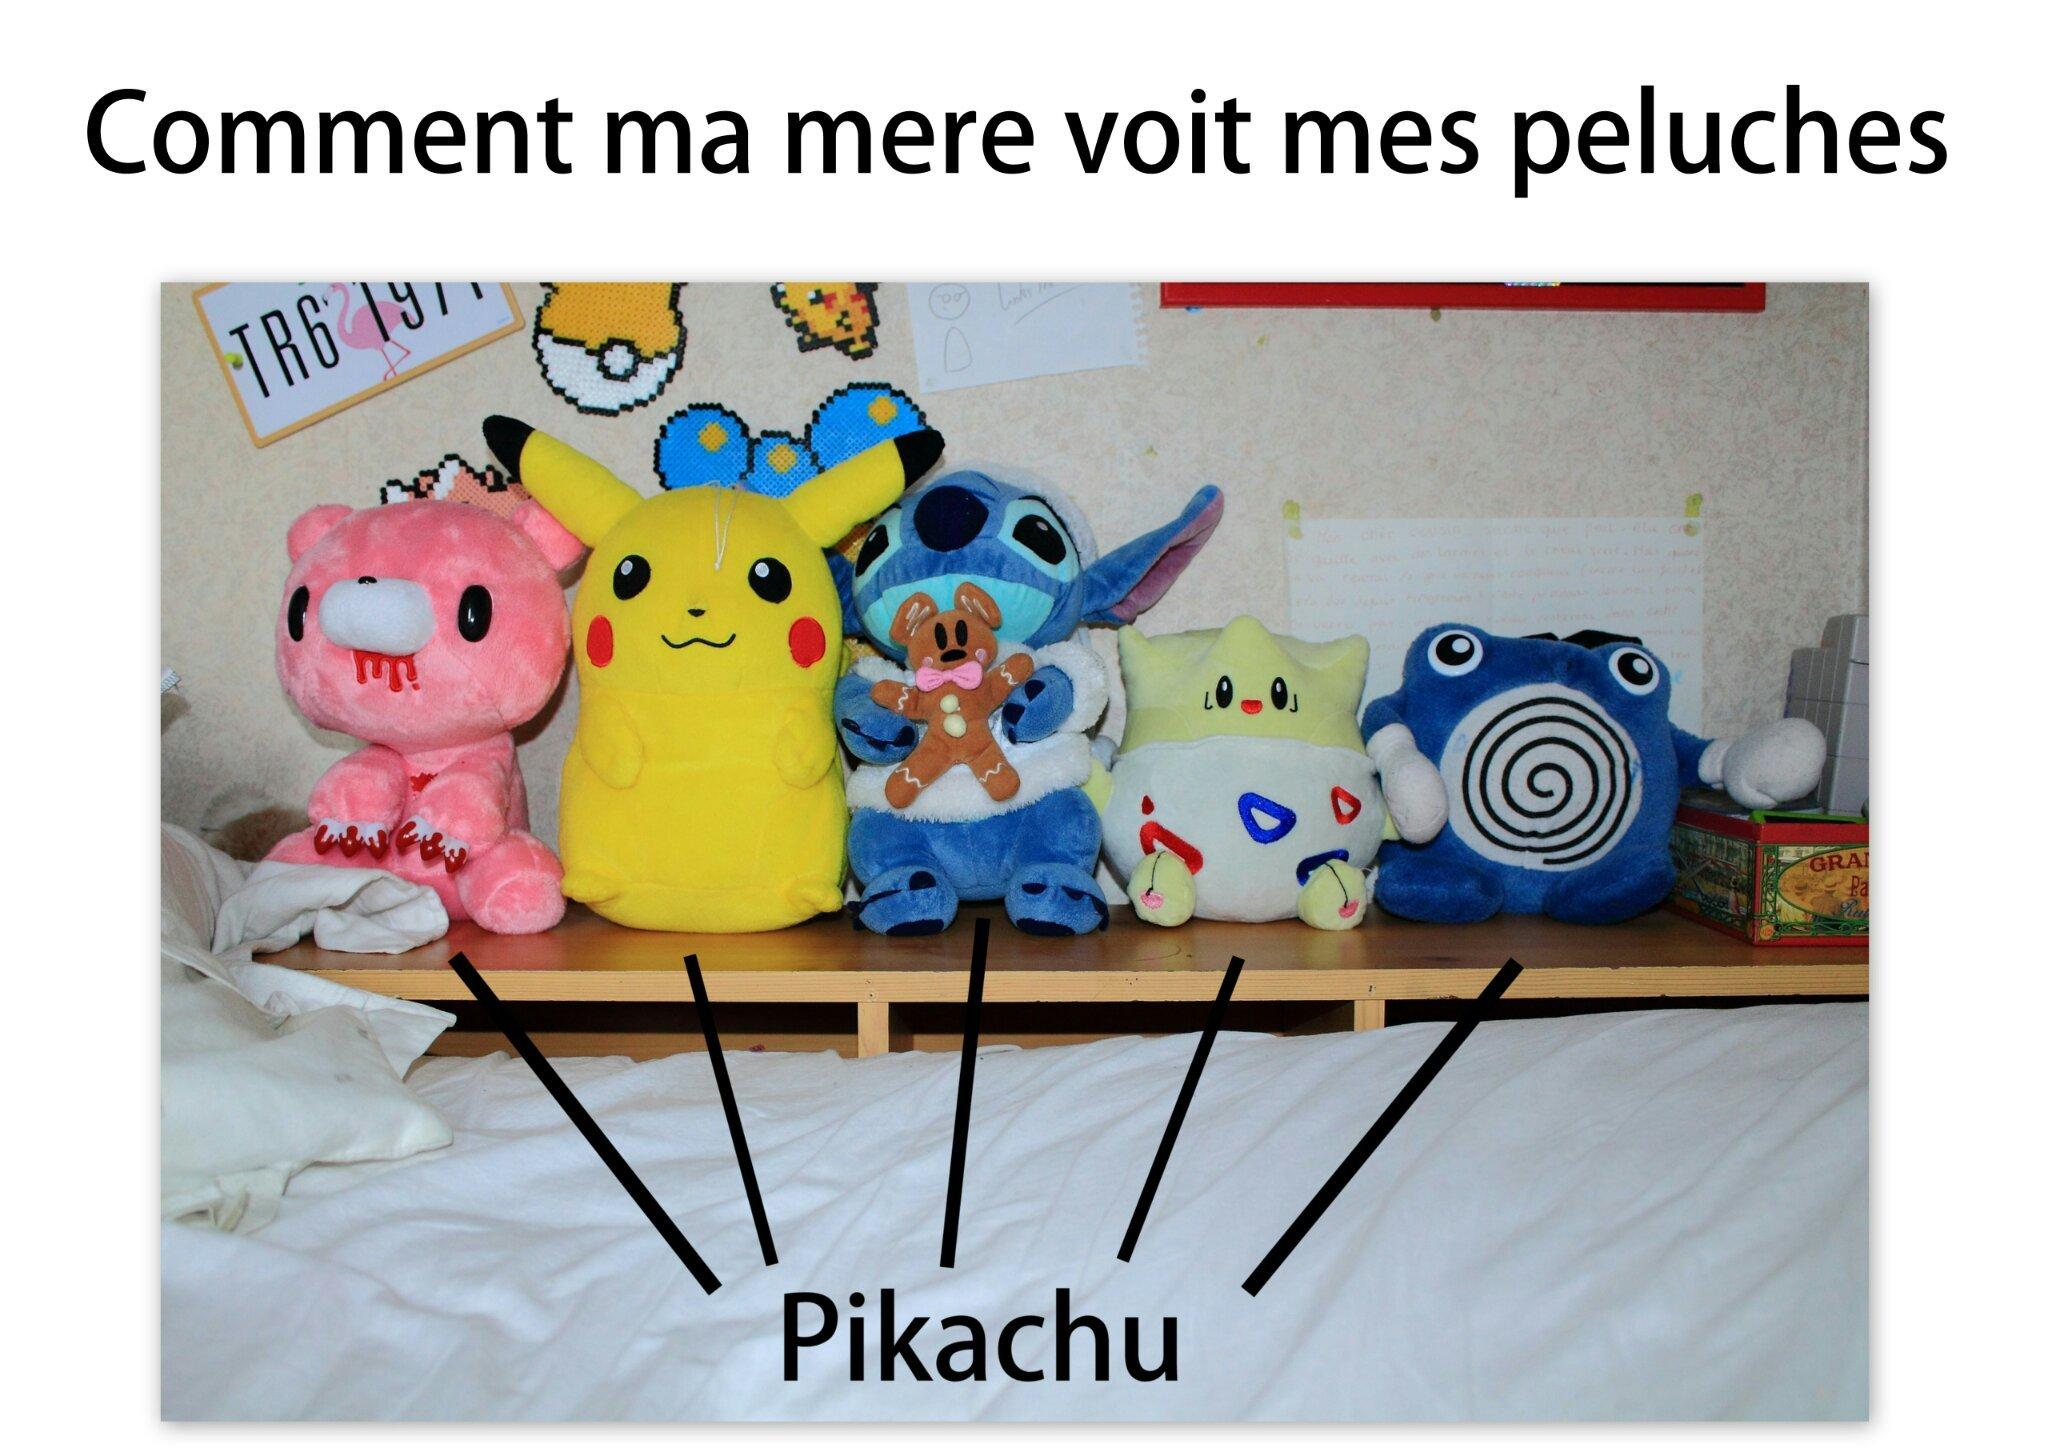 Pikachu world - meme